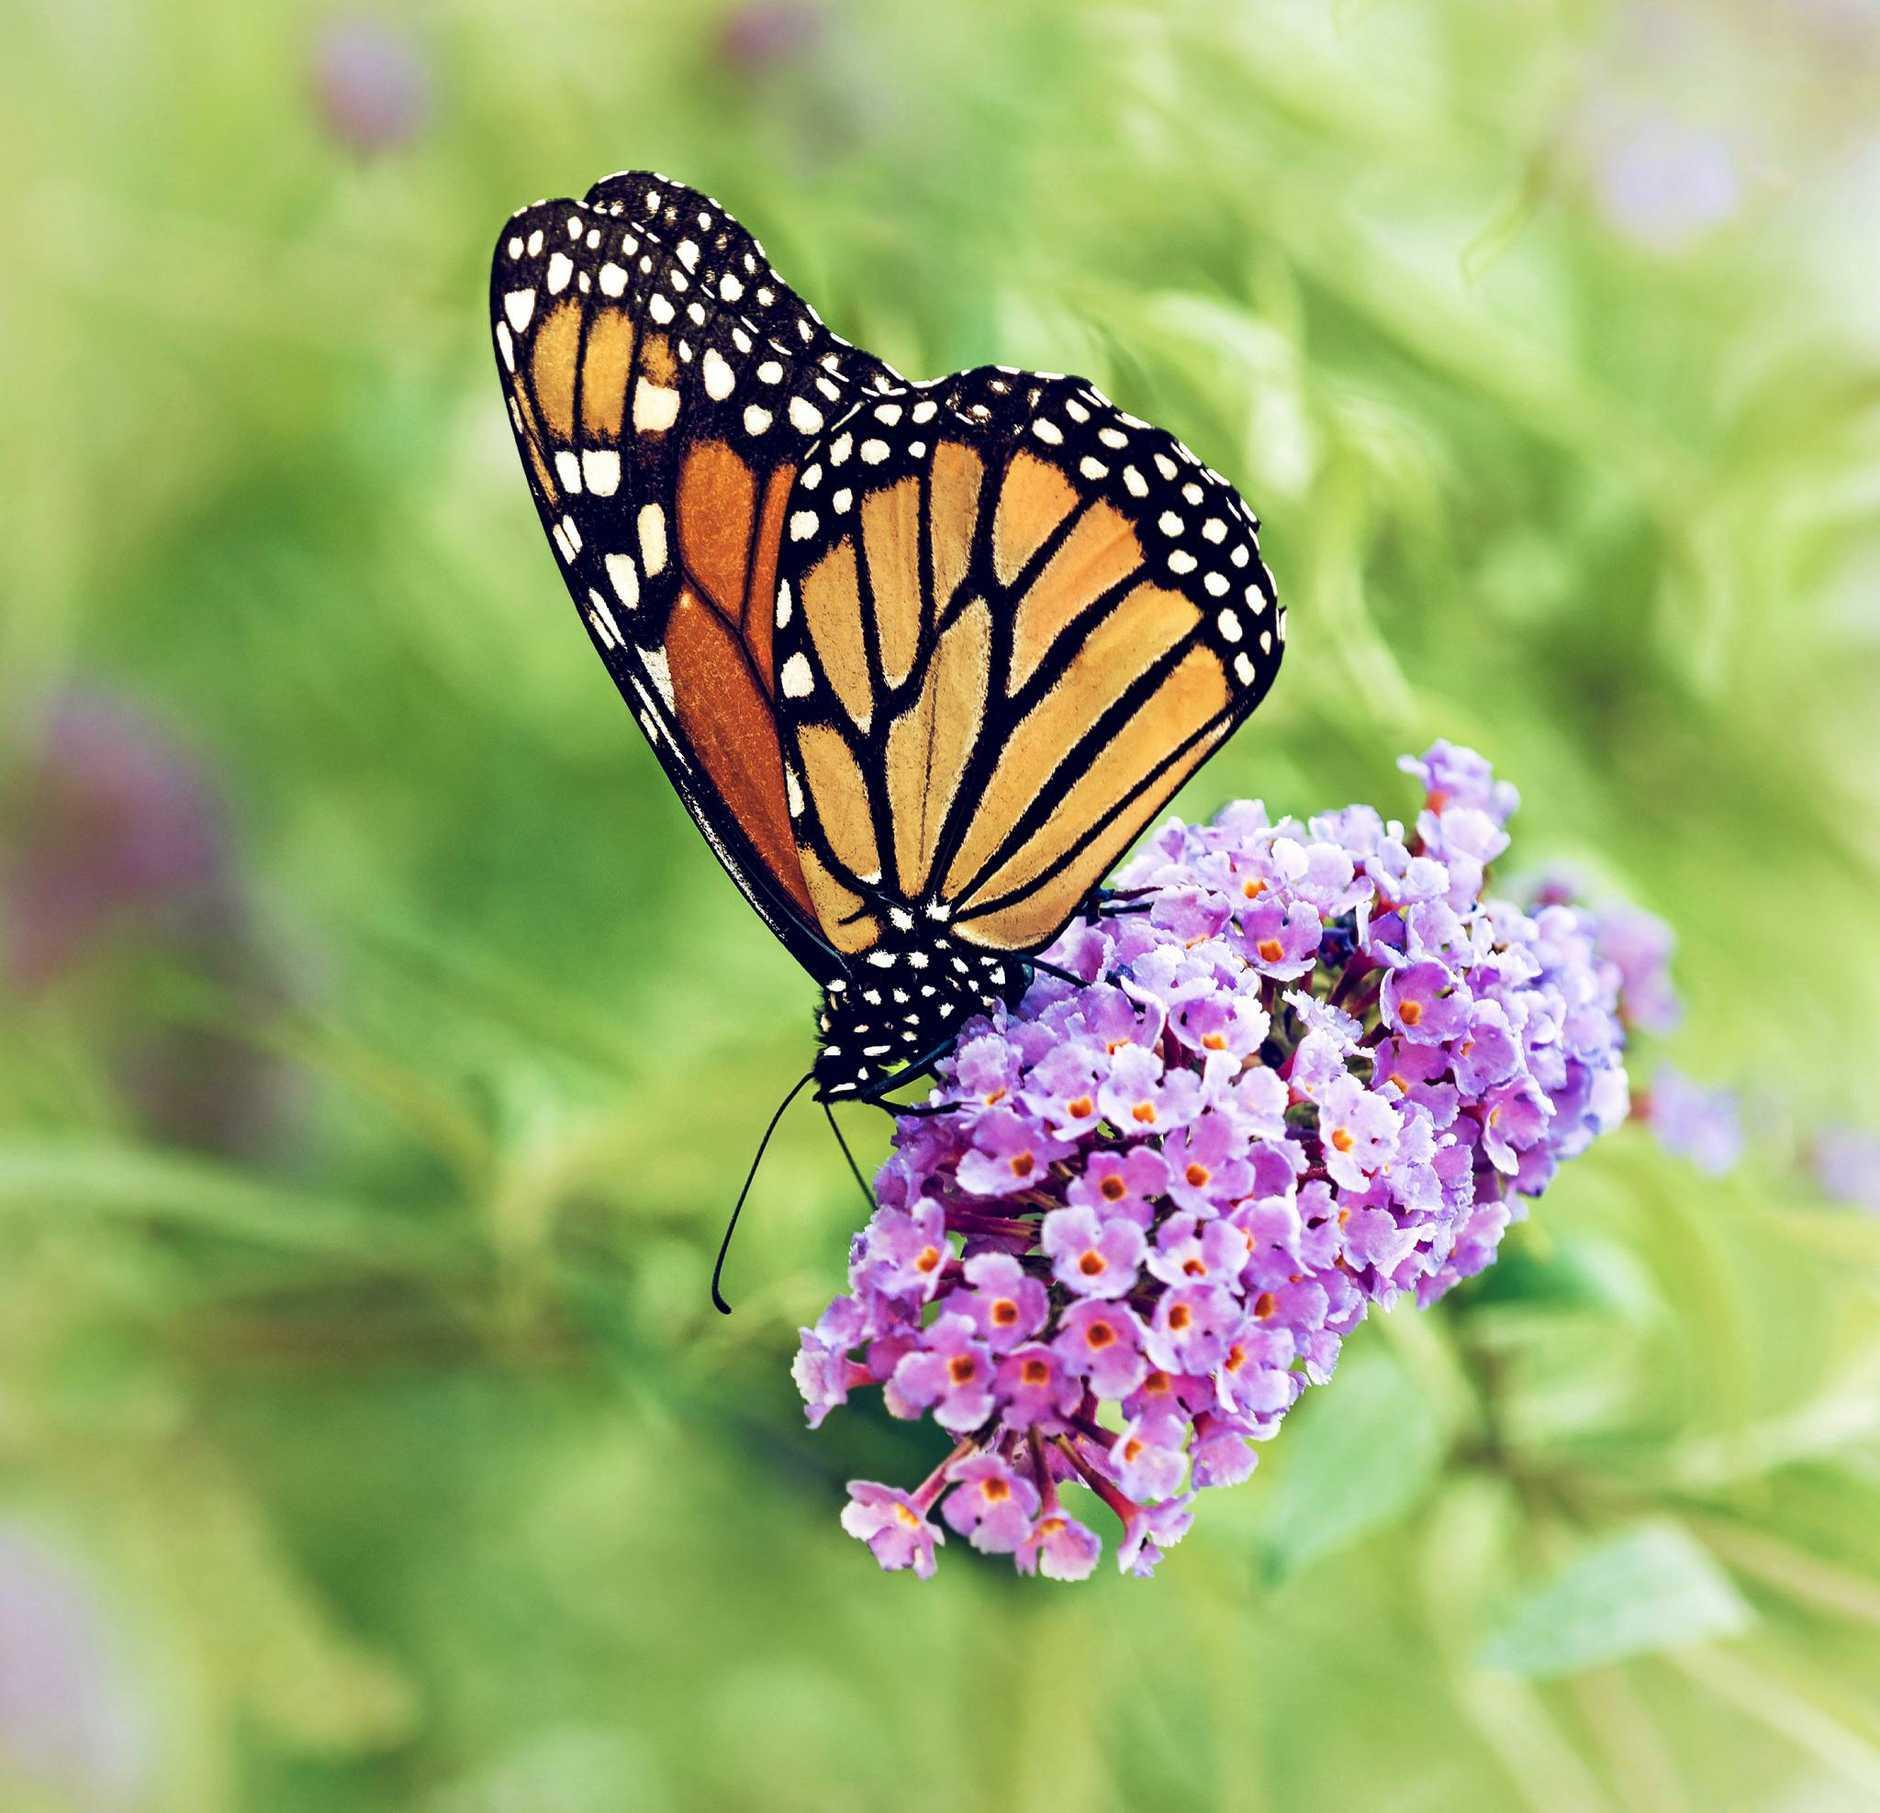 A monarch butterfly (danaus plexippus) feeds on butterfly bush (buddleia) flowers.